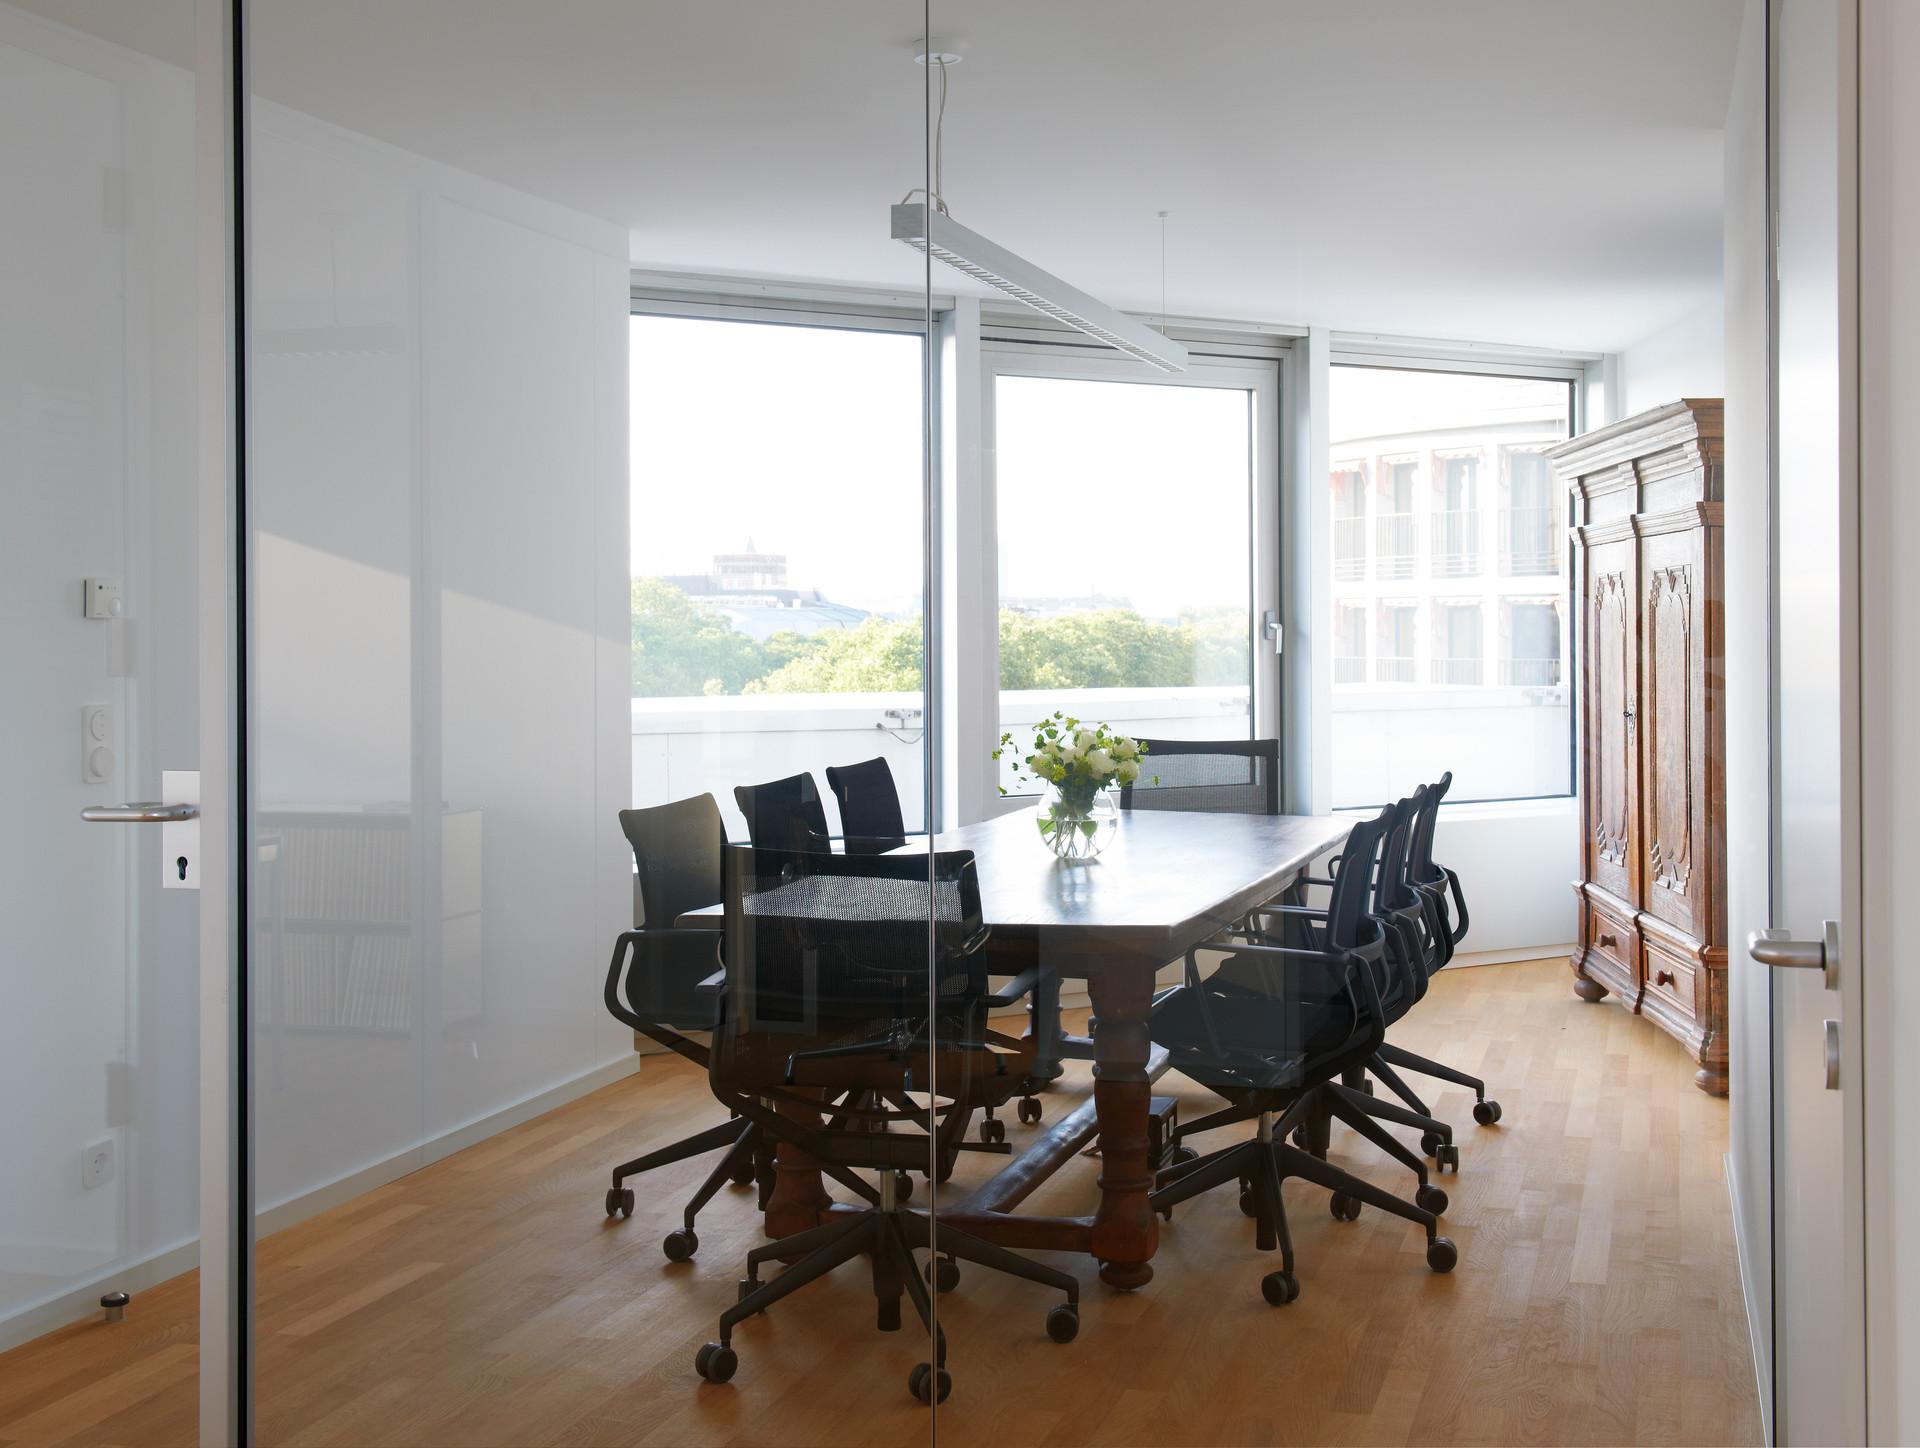 Stiftung Metzeler | Ben Dieckmann architects